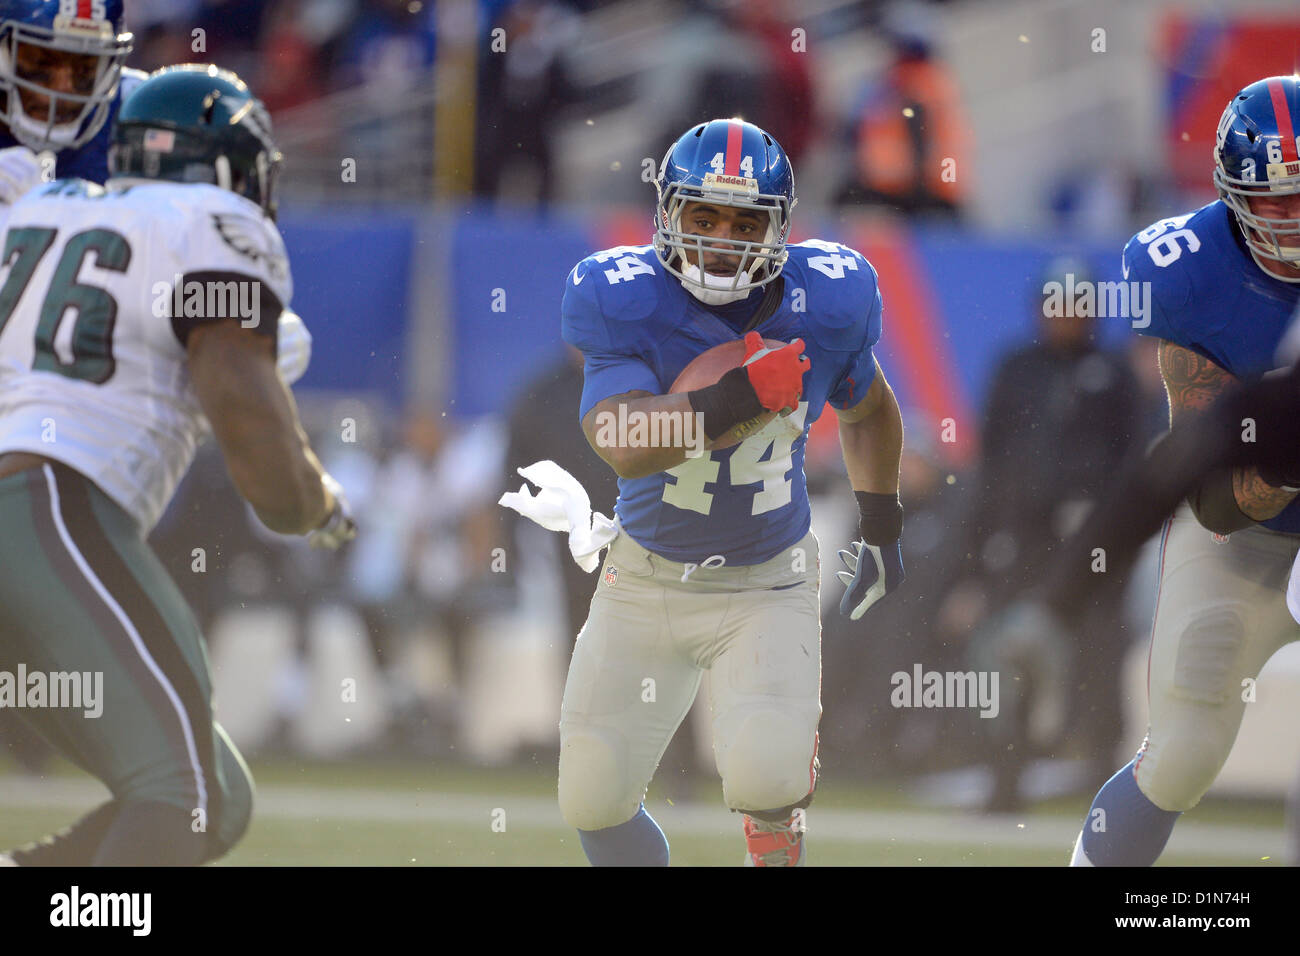 New Jersey, USA. 30 December 2012: New York Giants running back